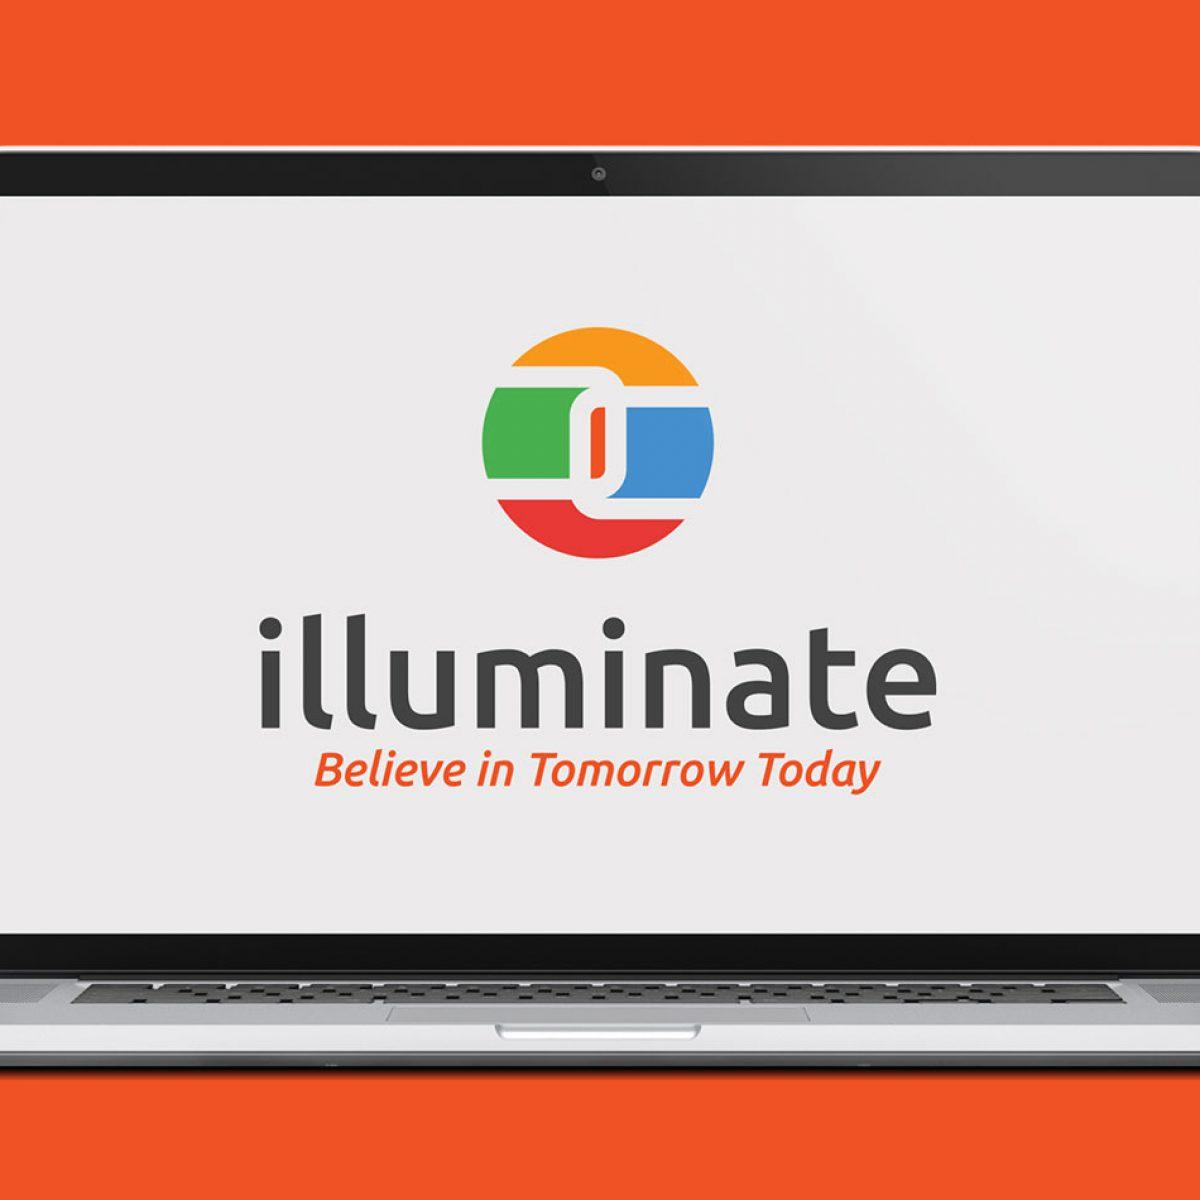 Illuminate Brand Identity